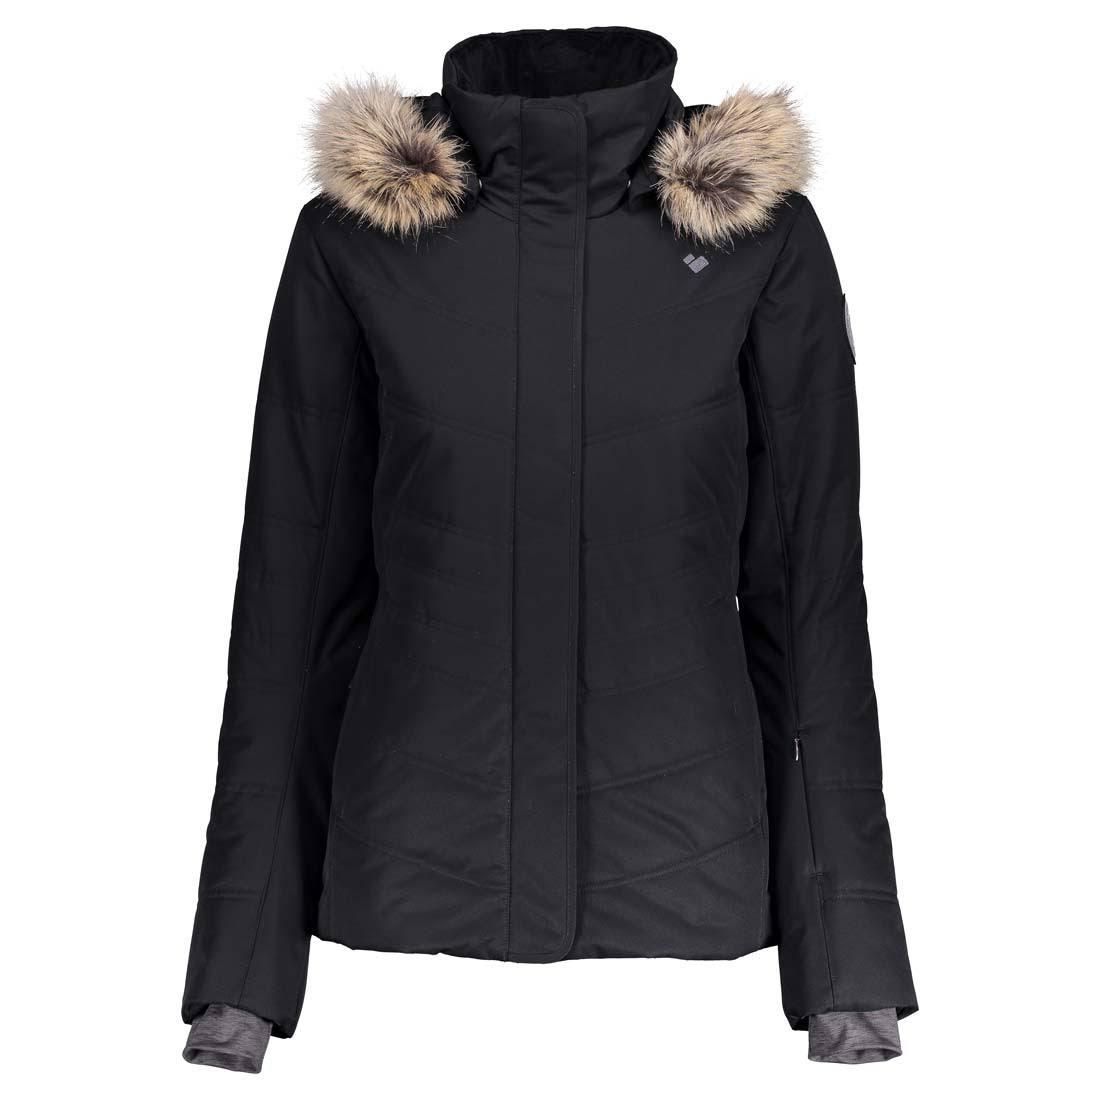 Jacket Tuscany Ii Damen 11105 Obermeyer Für q1wZt1